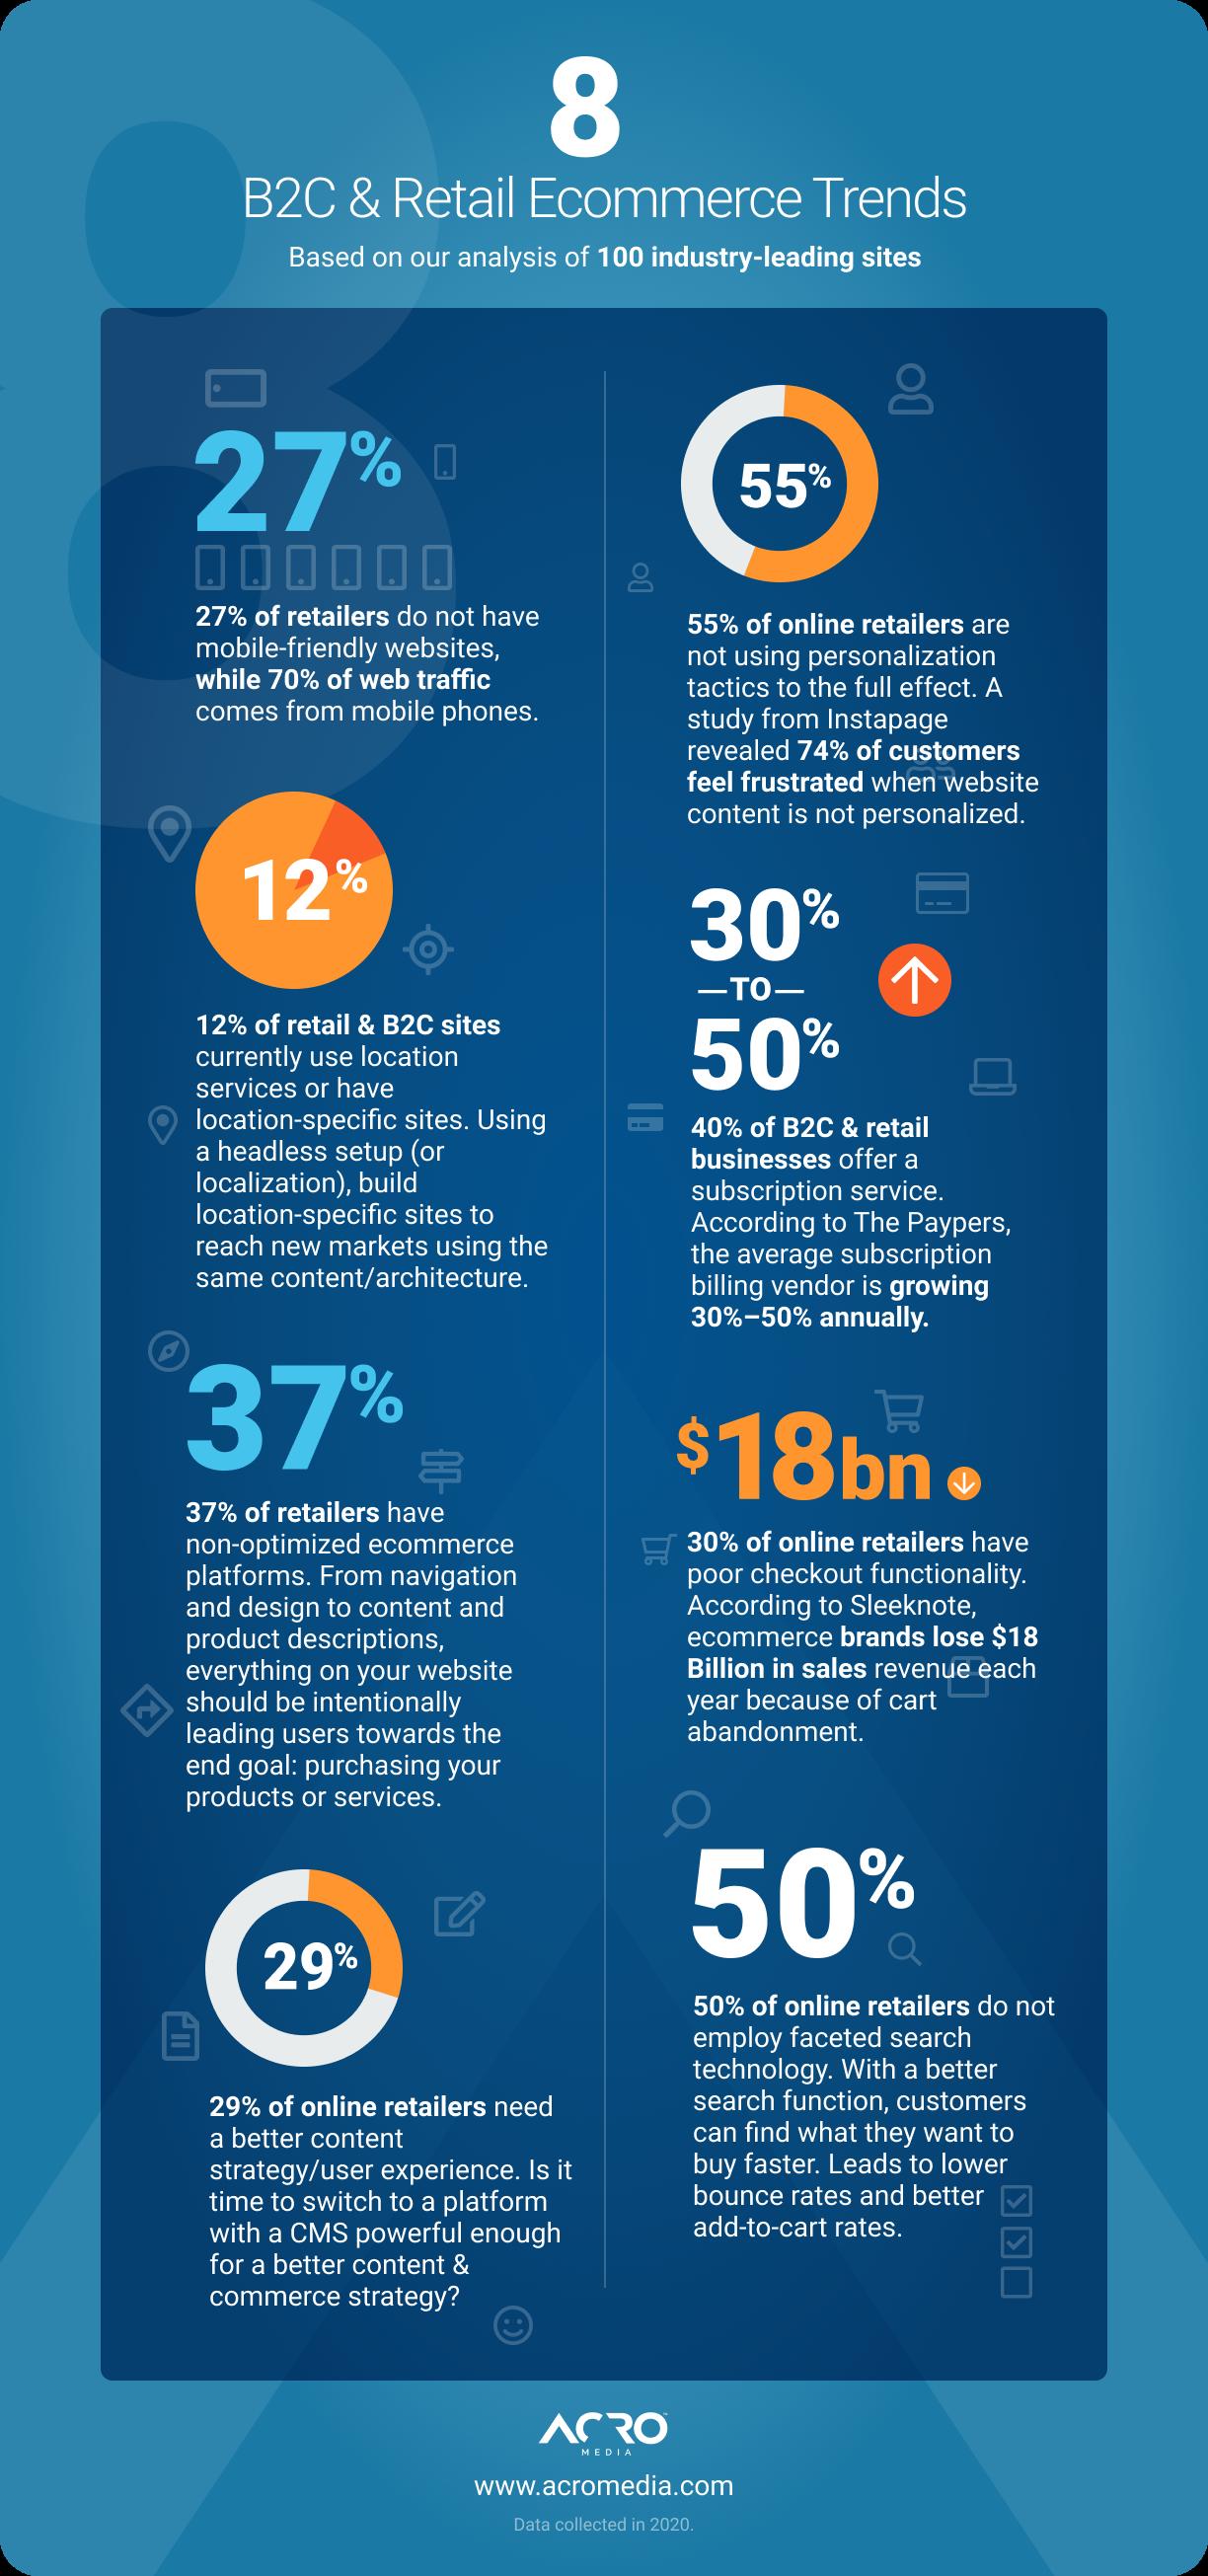 8 Trends - B2C & Retail Ecommerce Trends@2x